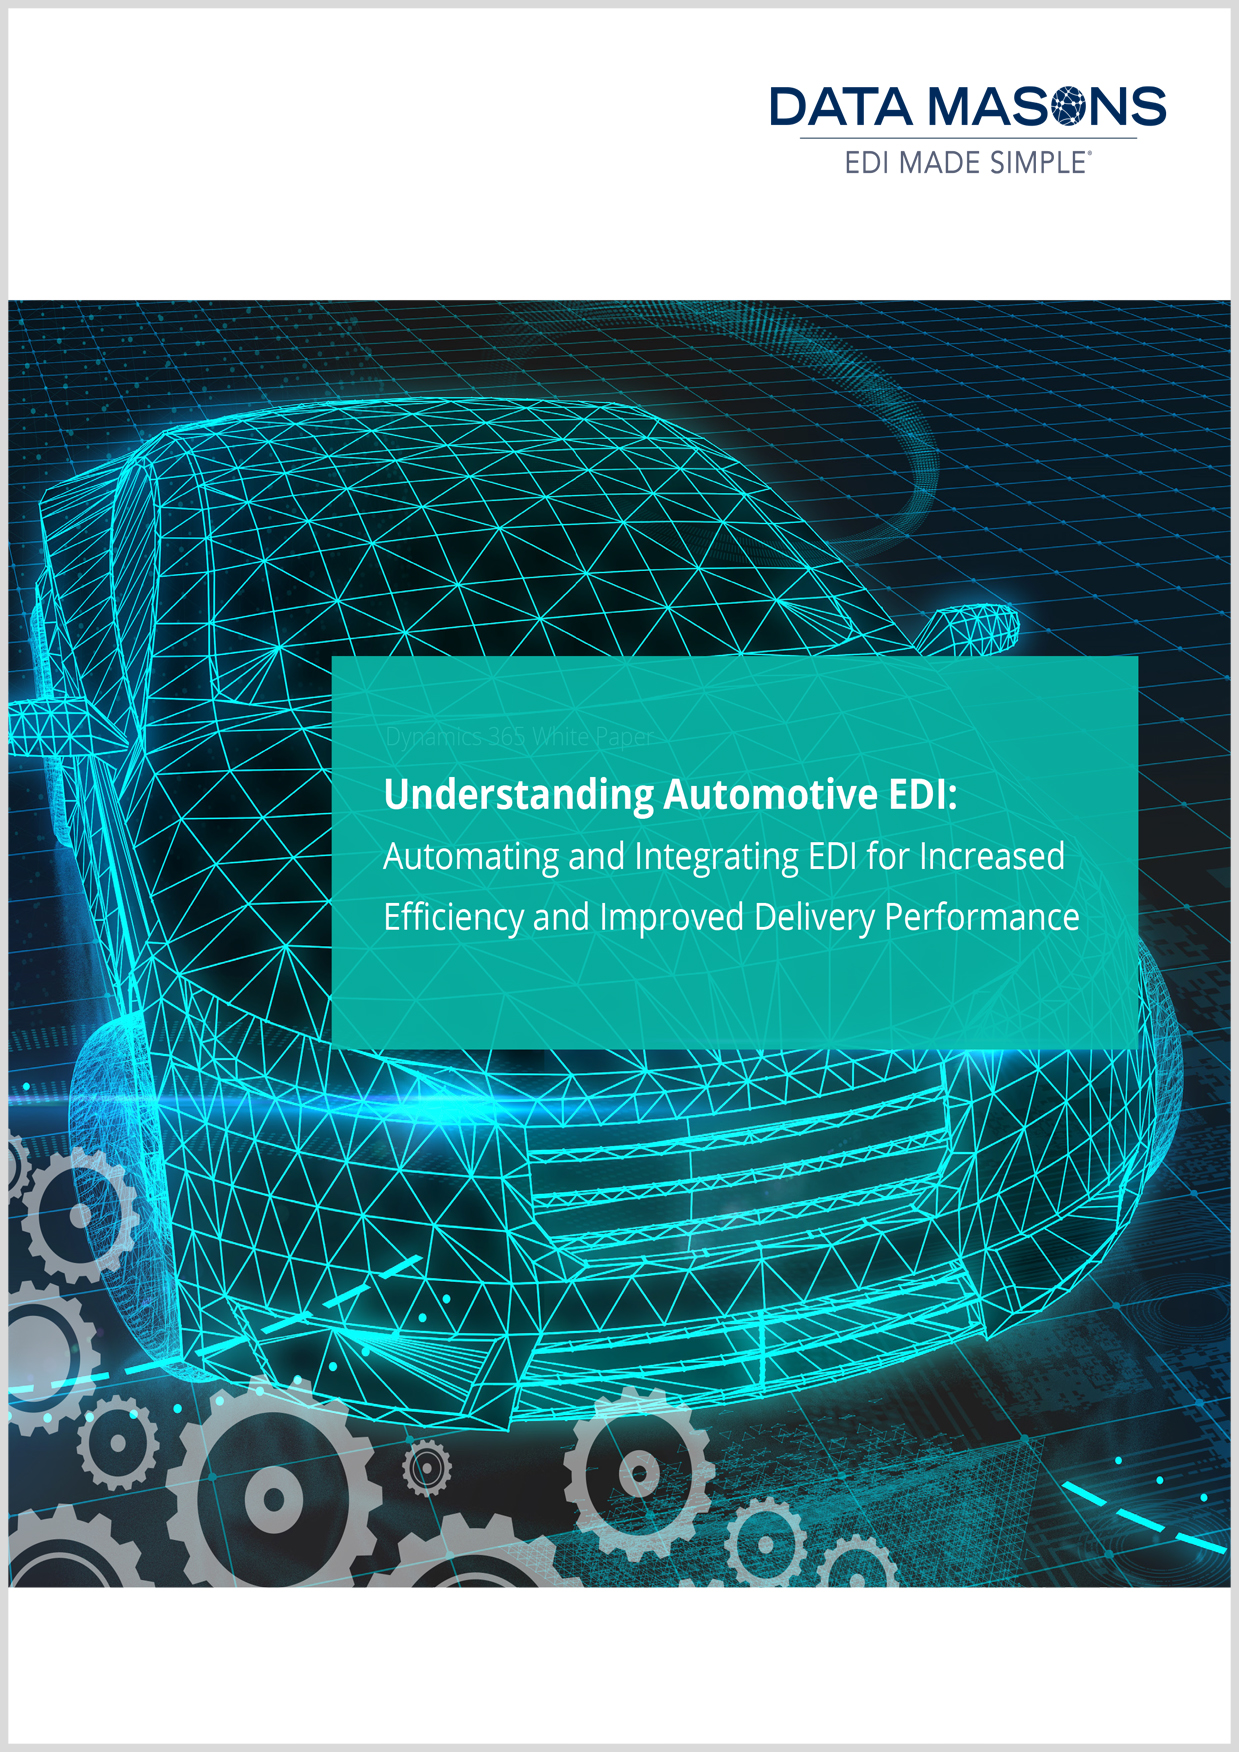 DATA MASON'S AUTOMOTIVE EDI -